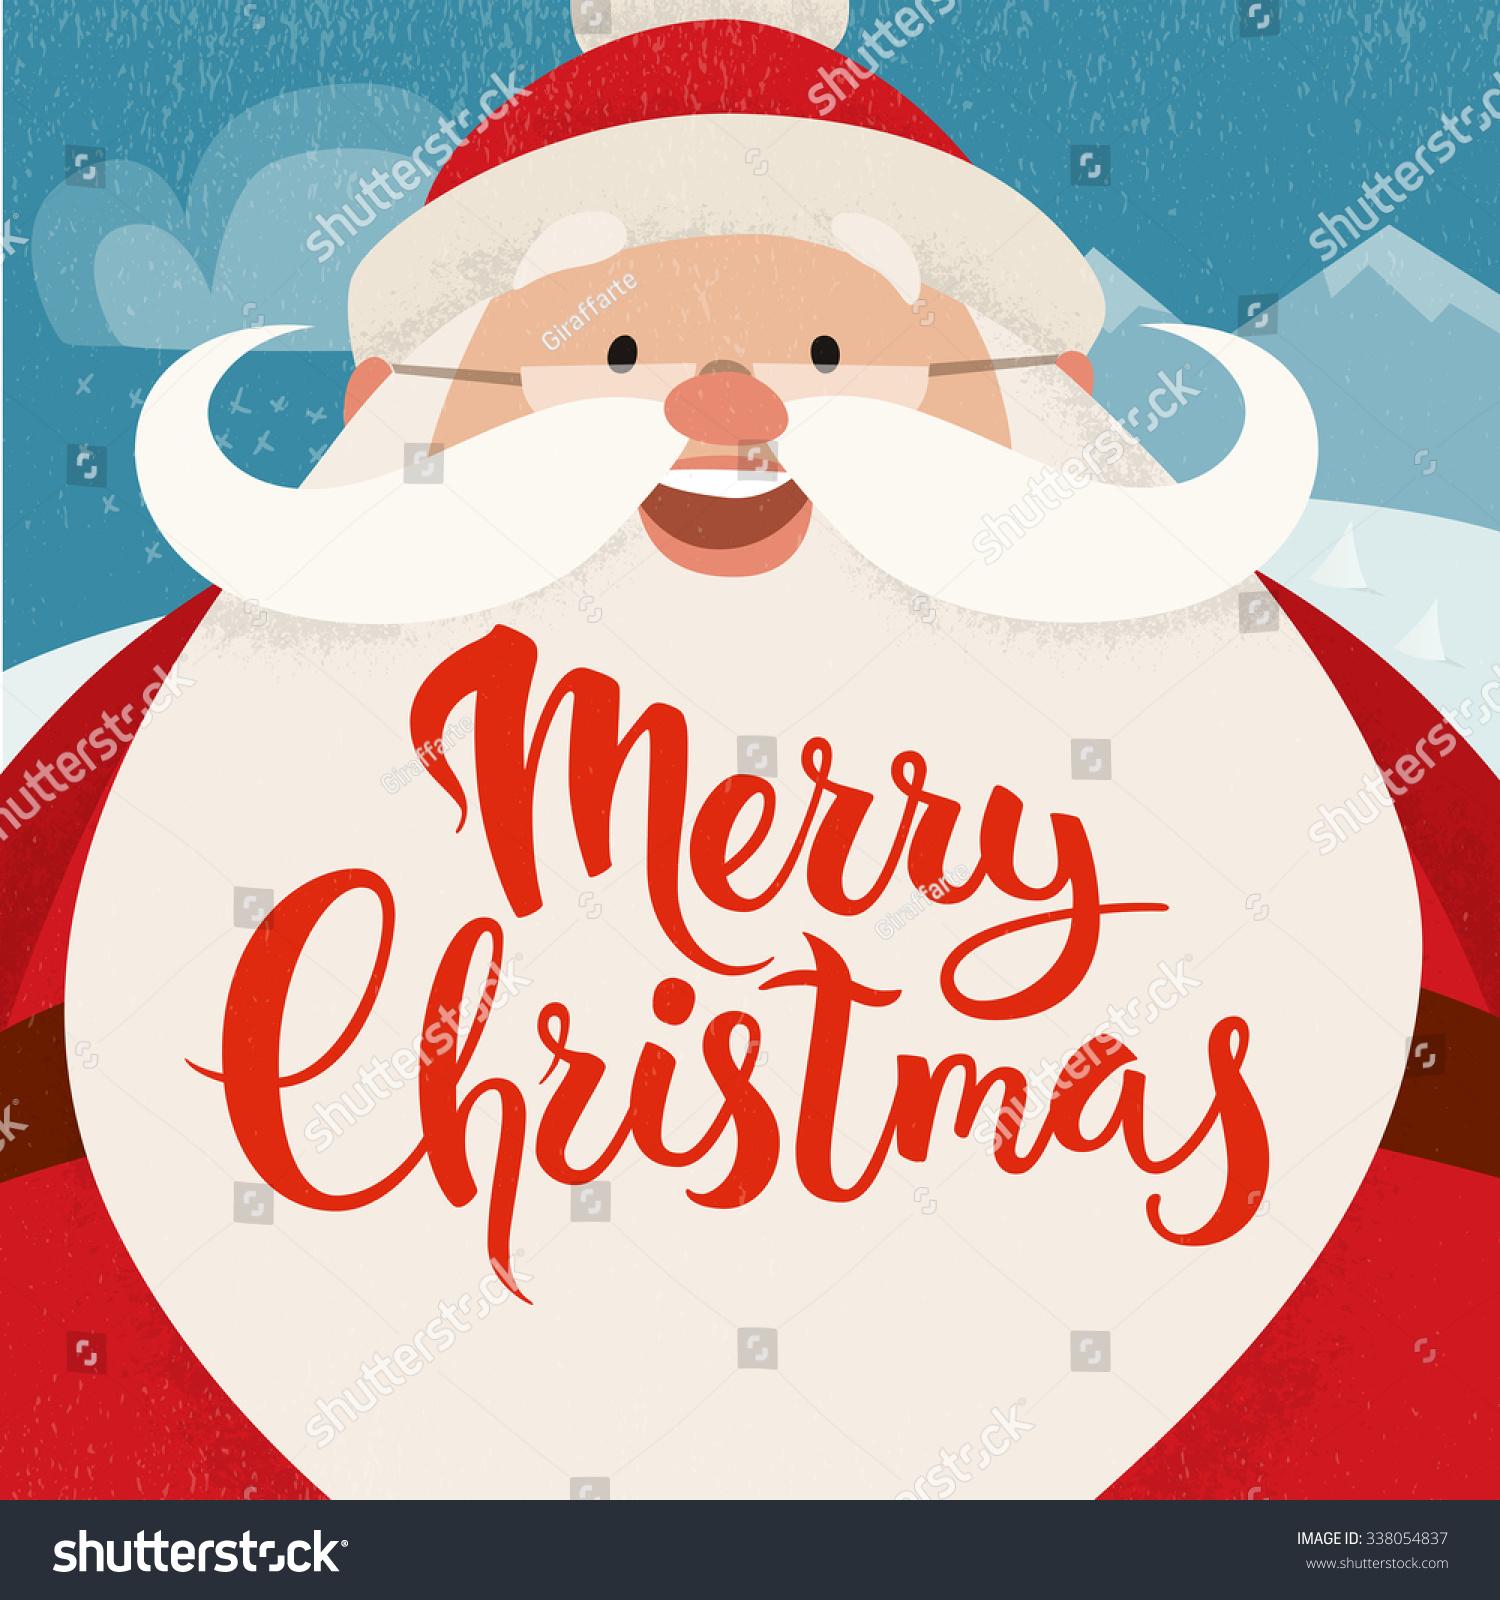 Merry Christmas Vector Card Funny Christmas Stock Vector Royalty